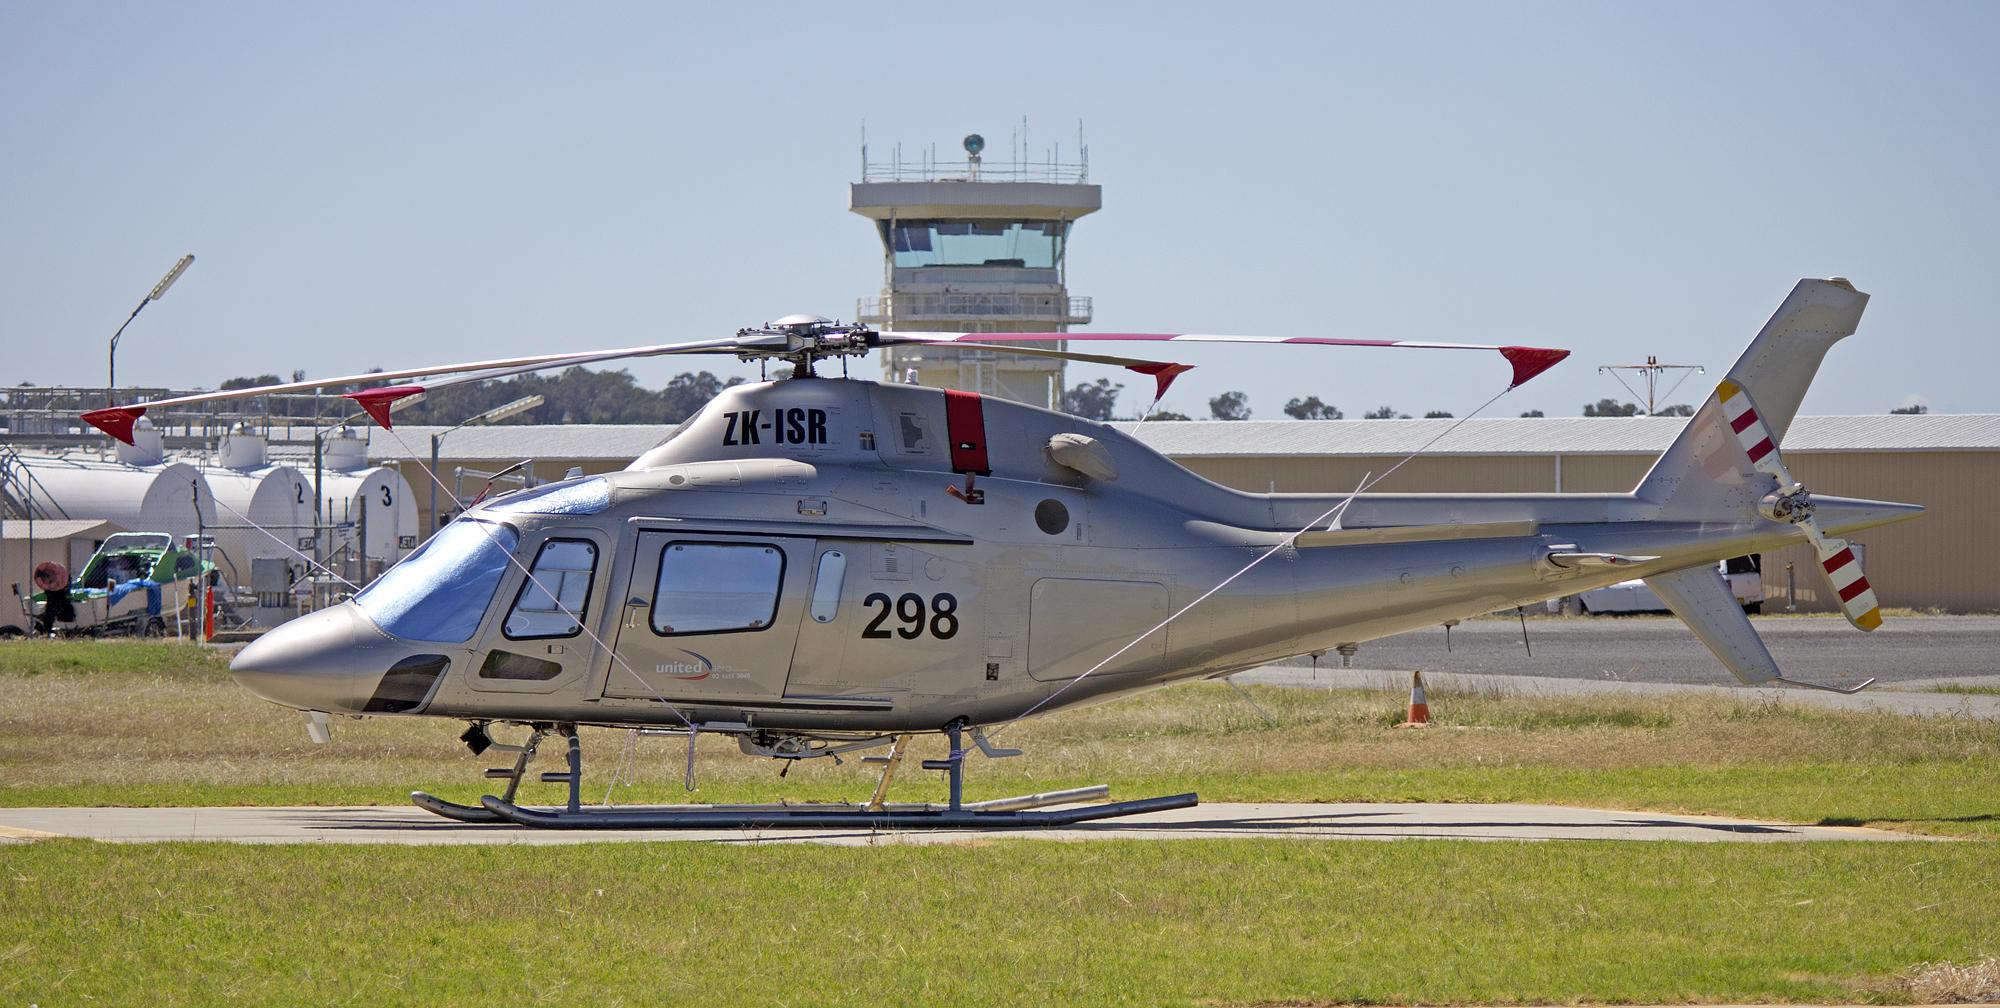 AgustaWestland_AW119_Koala_Ke_(ZK-ISR)_at_the_Wagga_Wagga_Airport_heli-pad